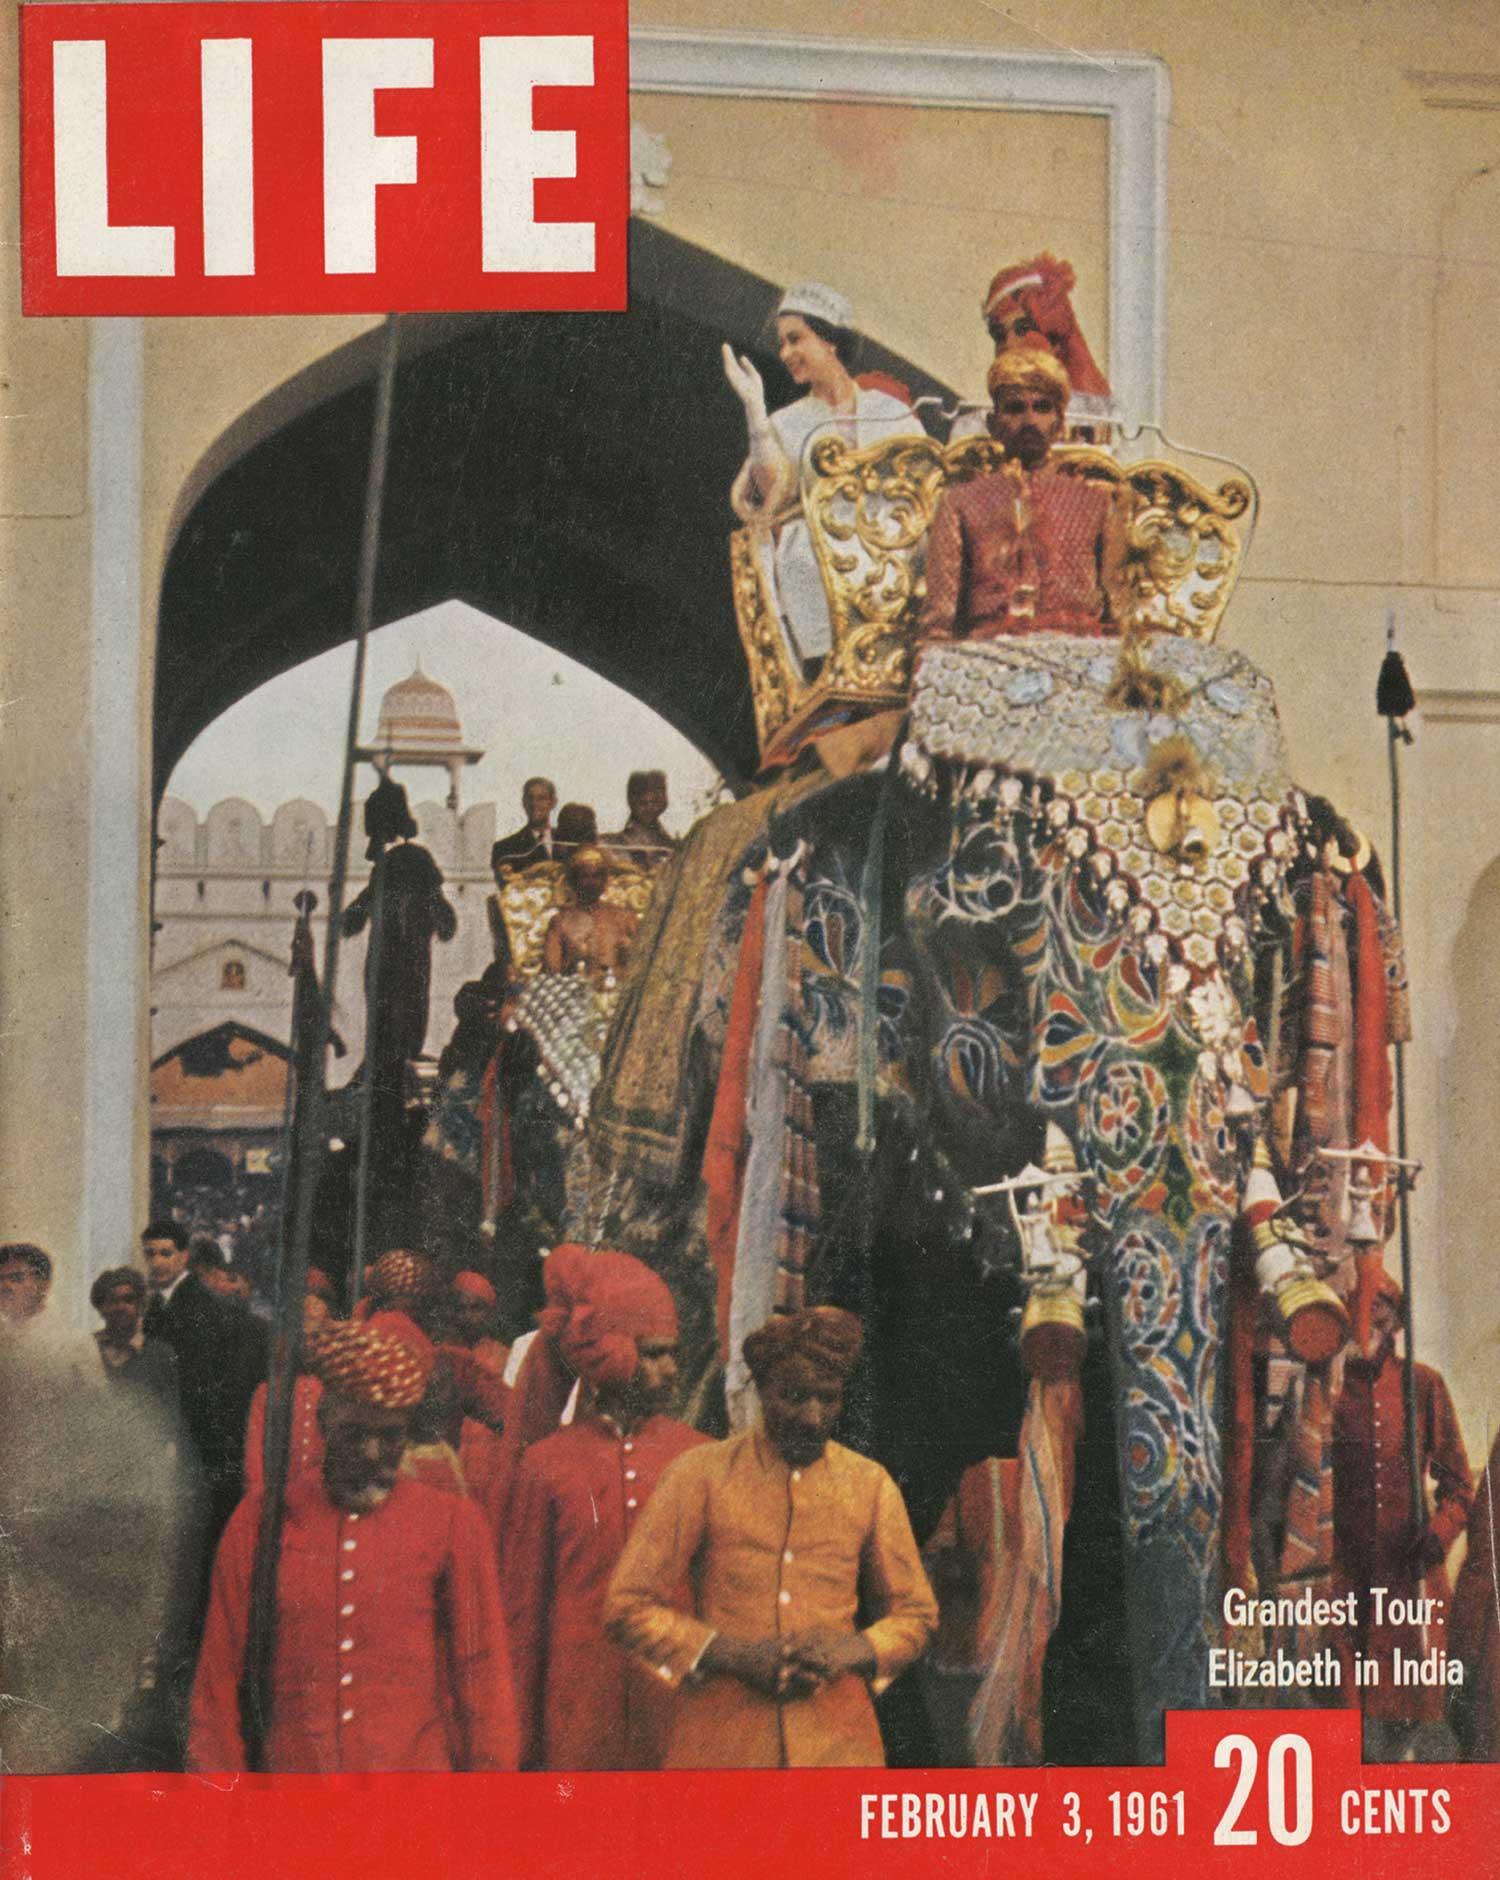 1961_LIFE_cover_full_flat_1500w.jpg